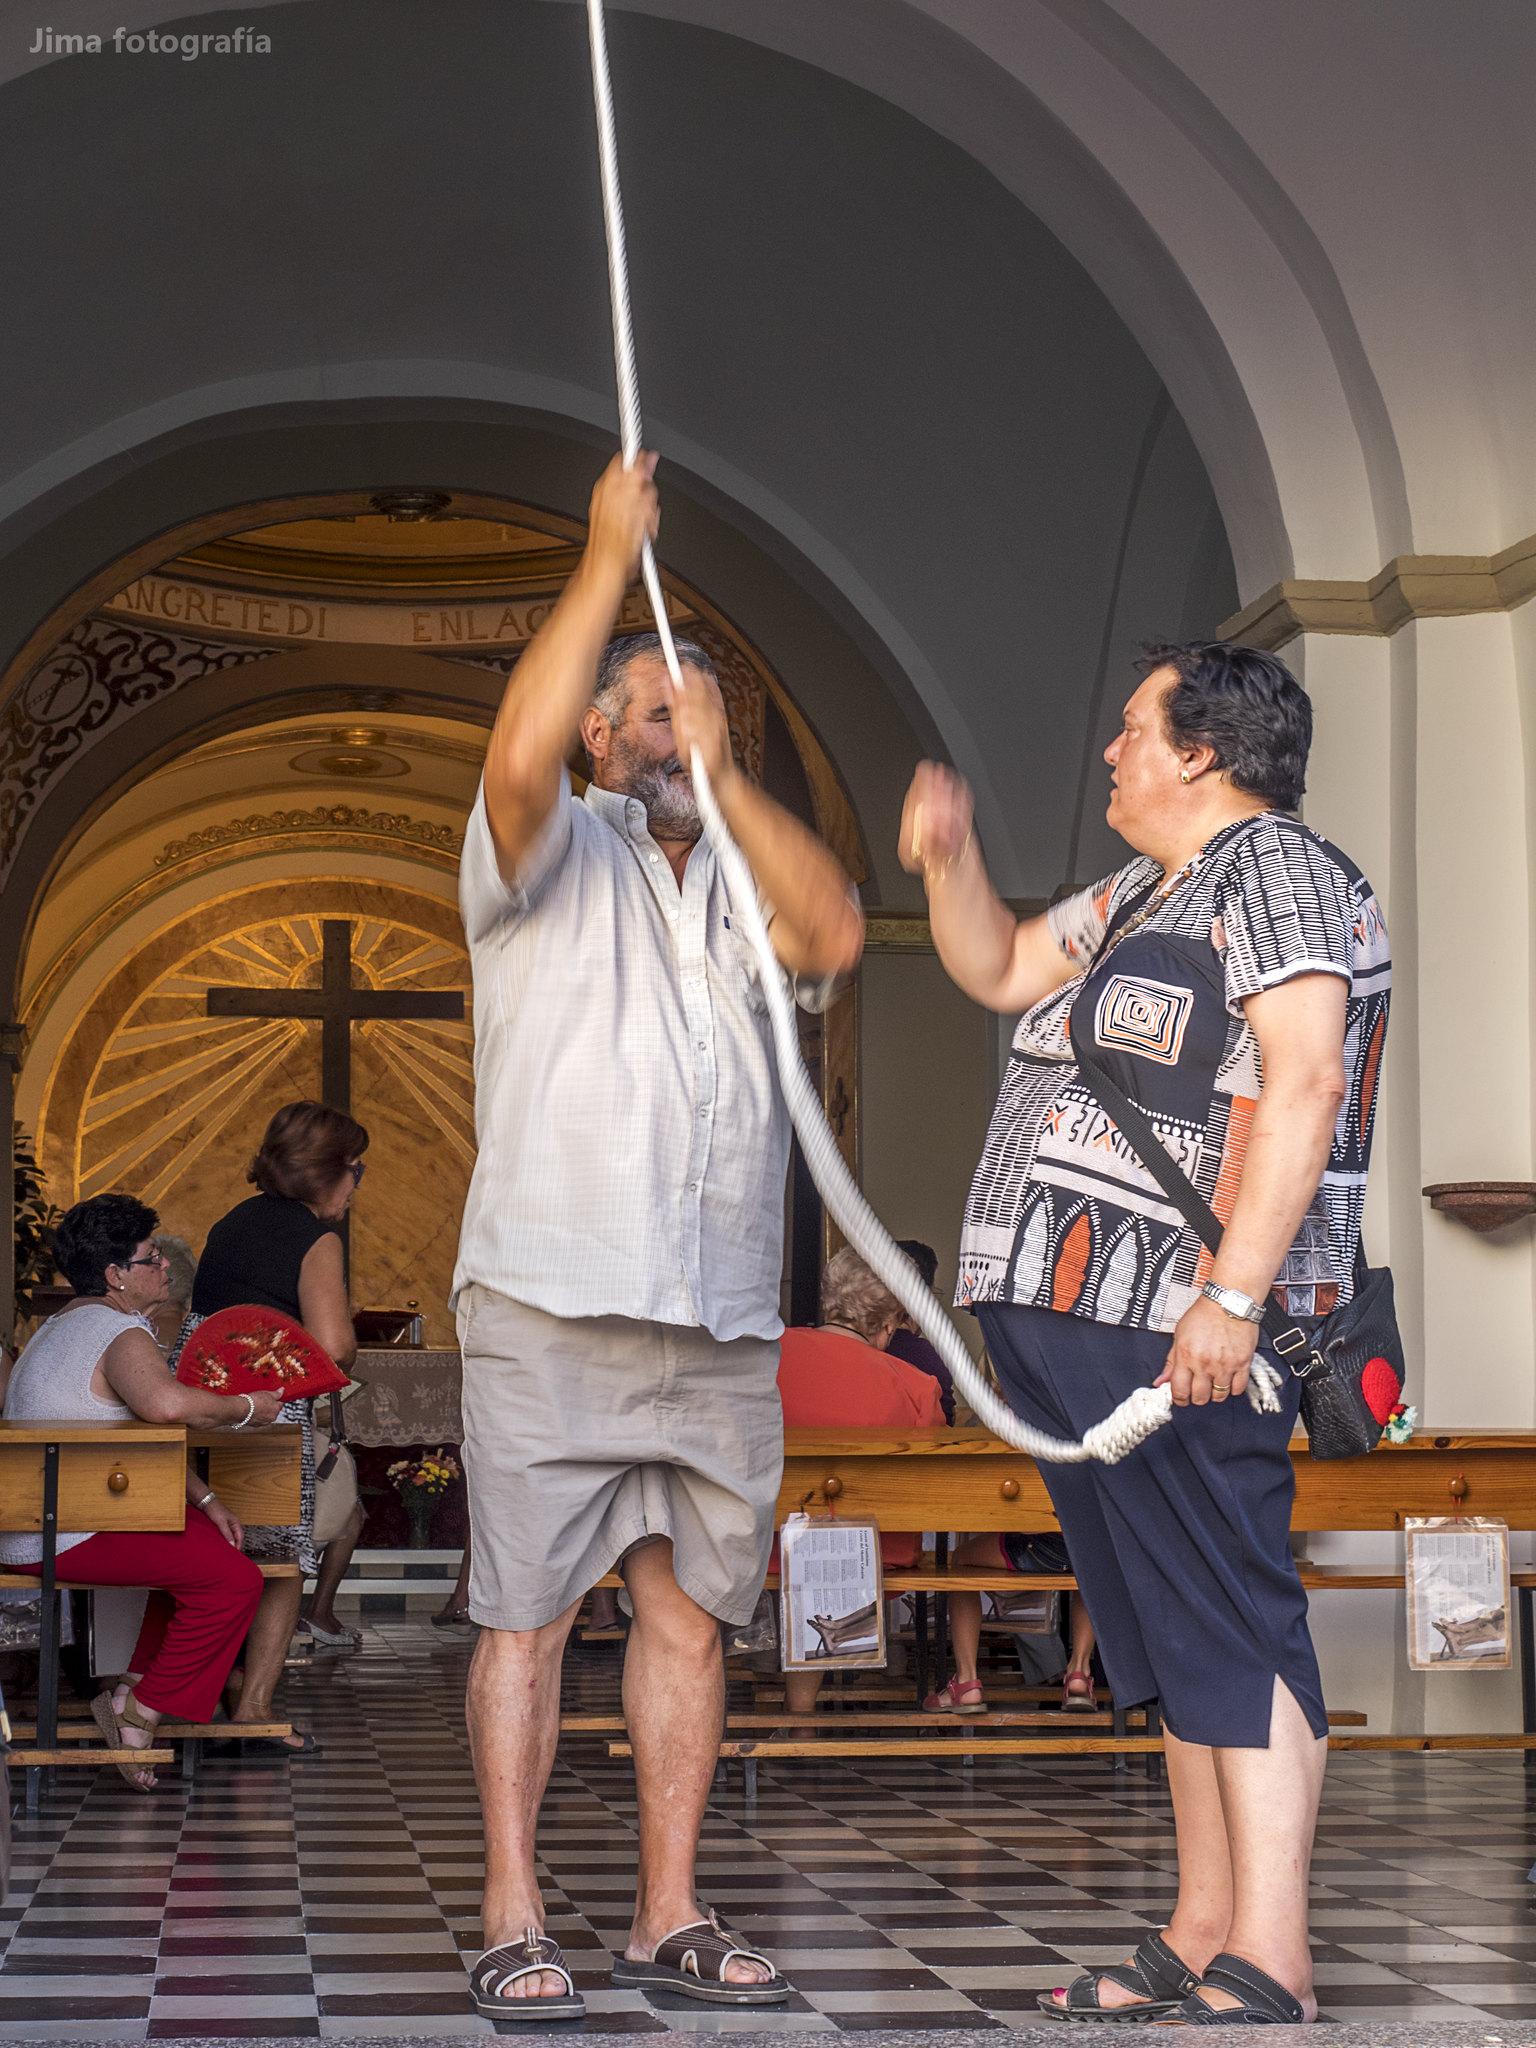 (2015-07-05) - Procesión subida - José Ignacio Máñez Azorín (10)